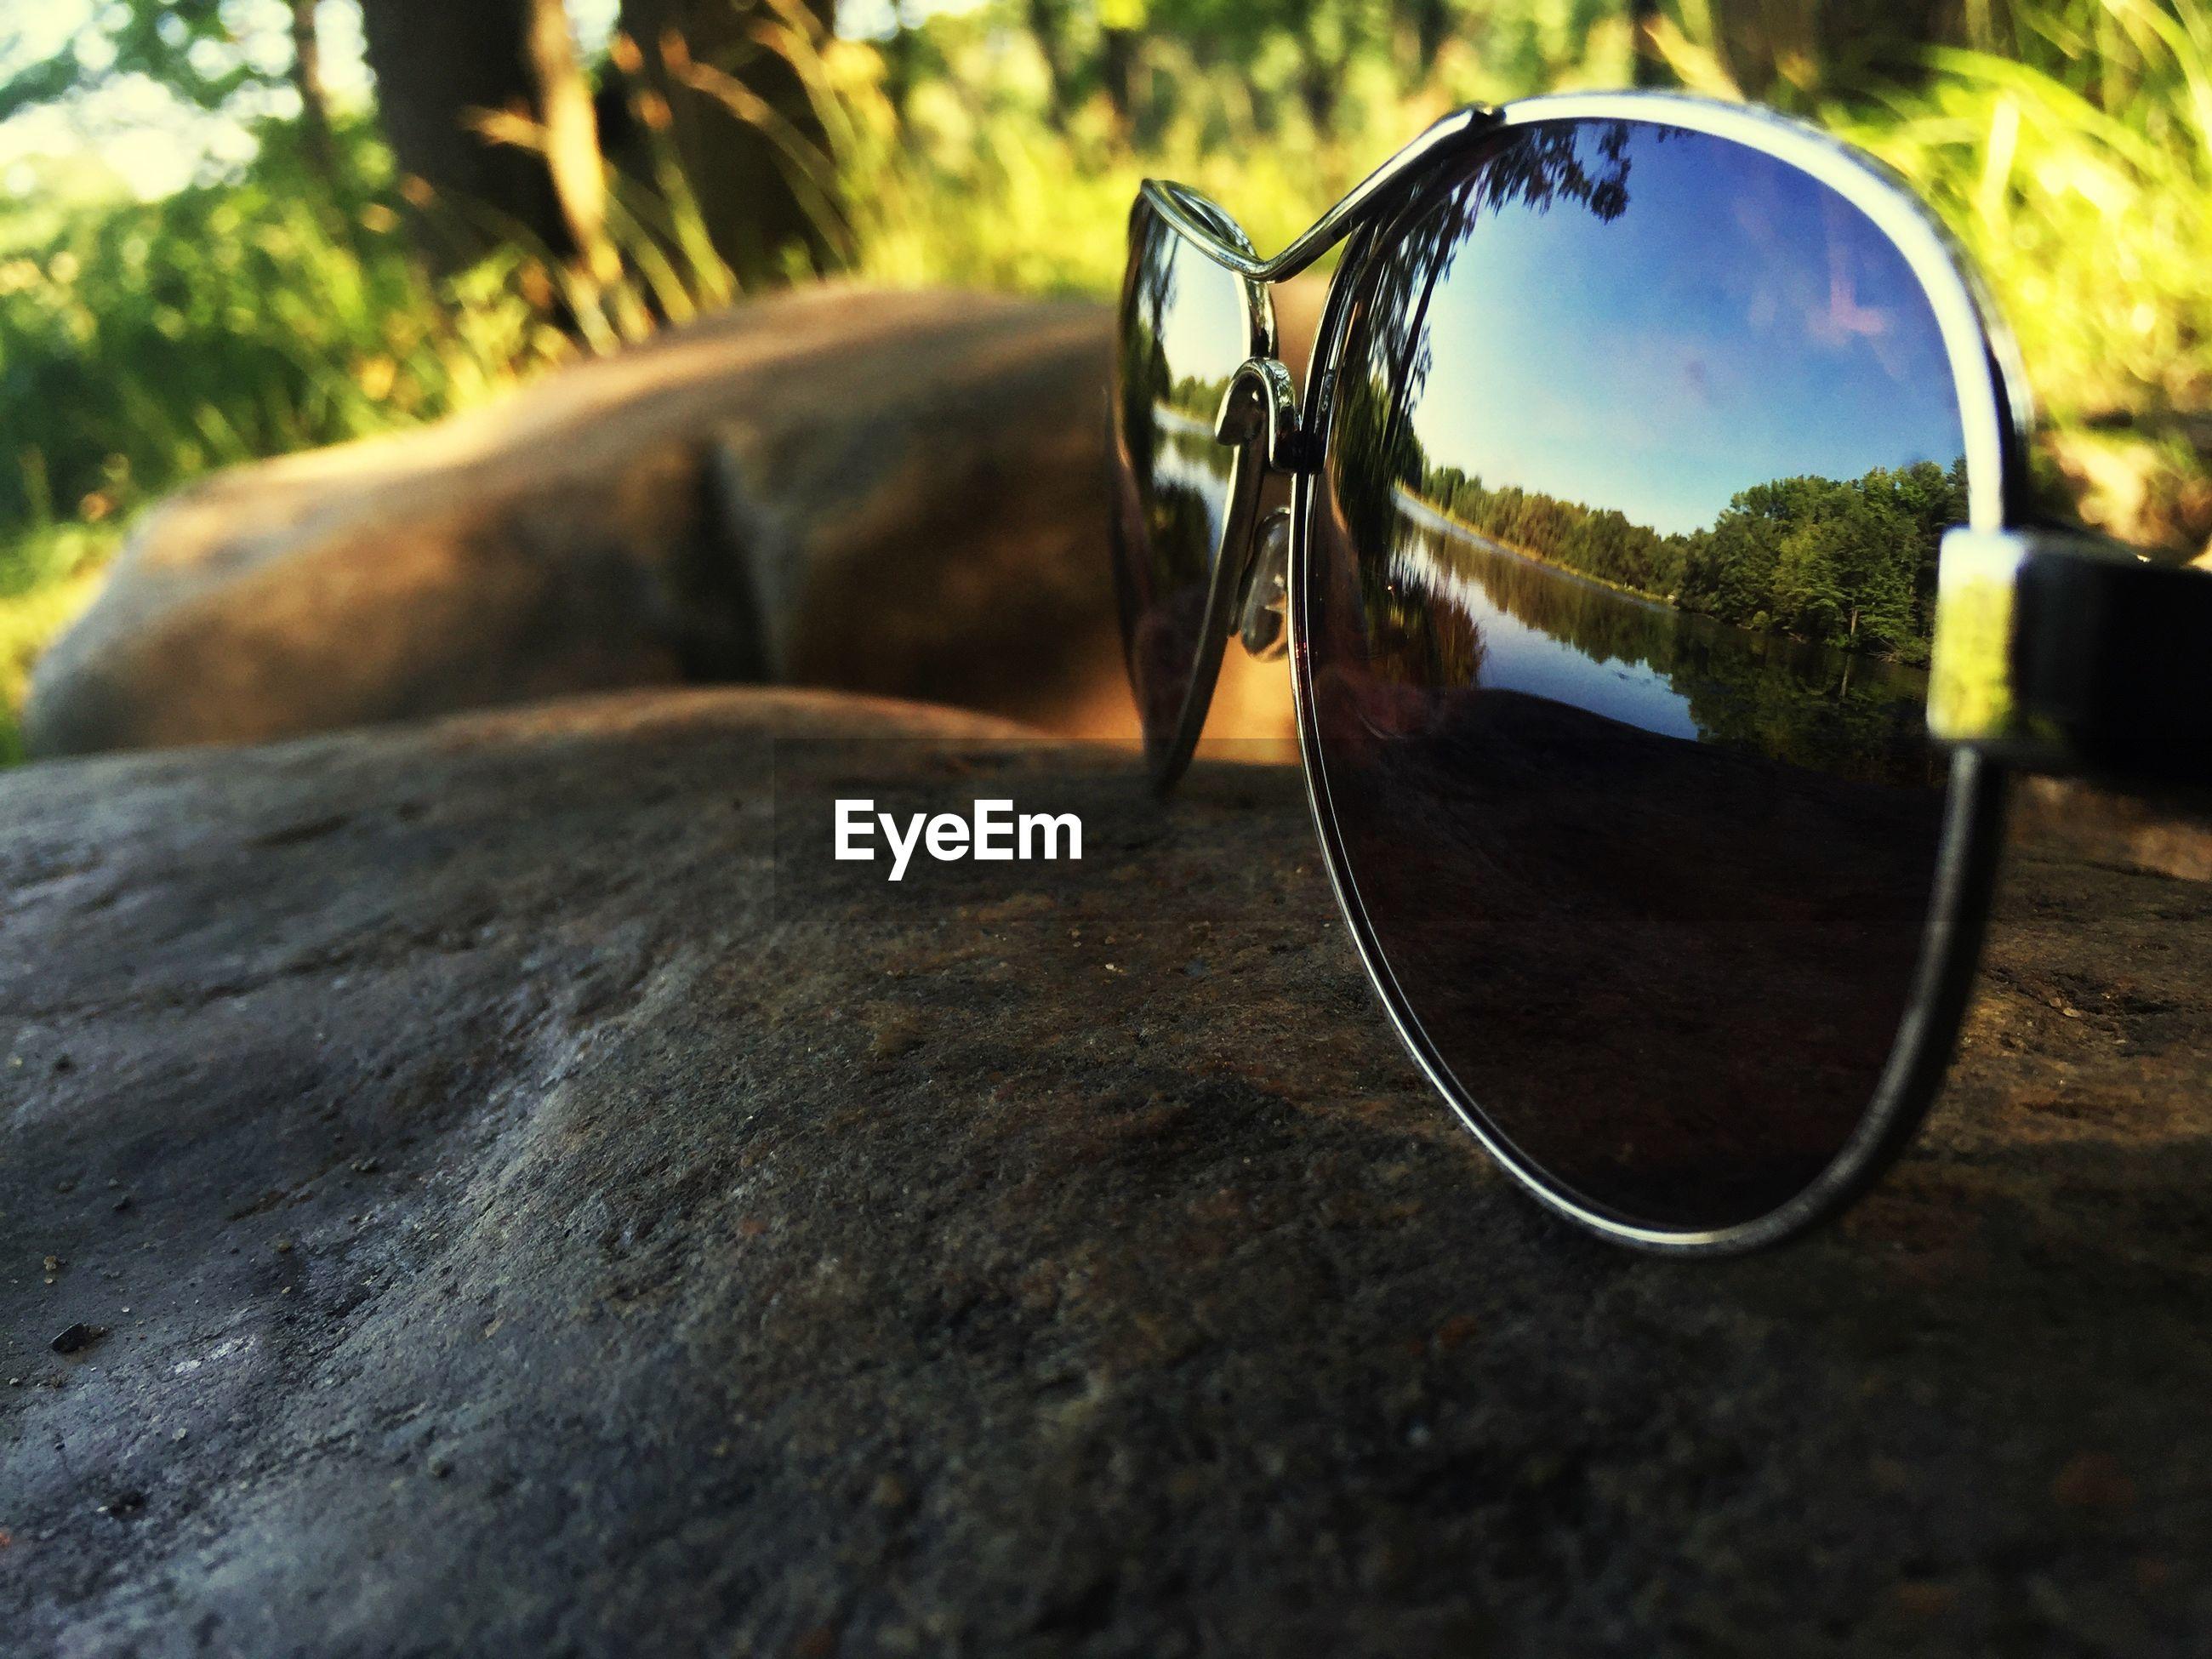 Reflection of lake on sunglasses